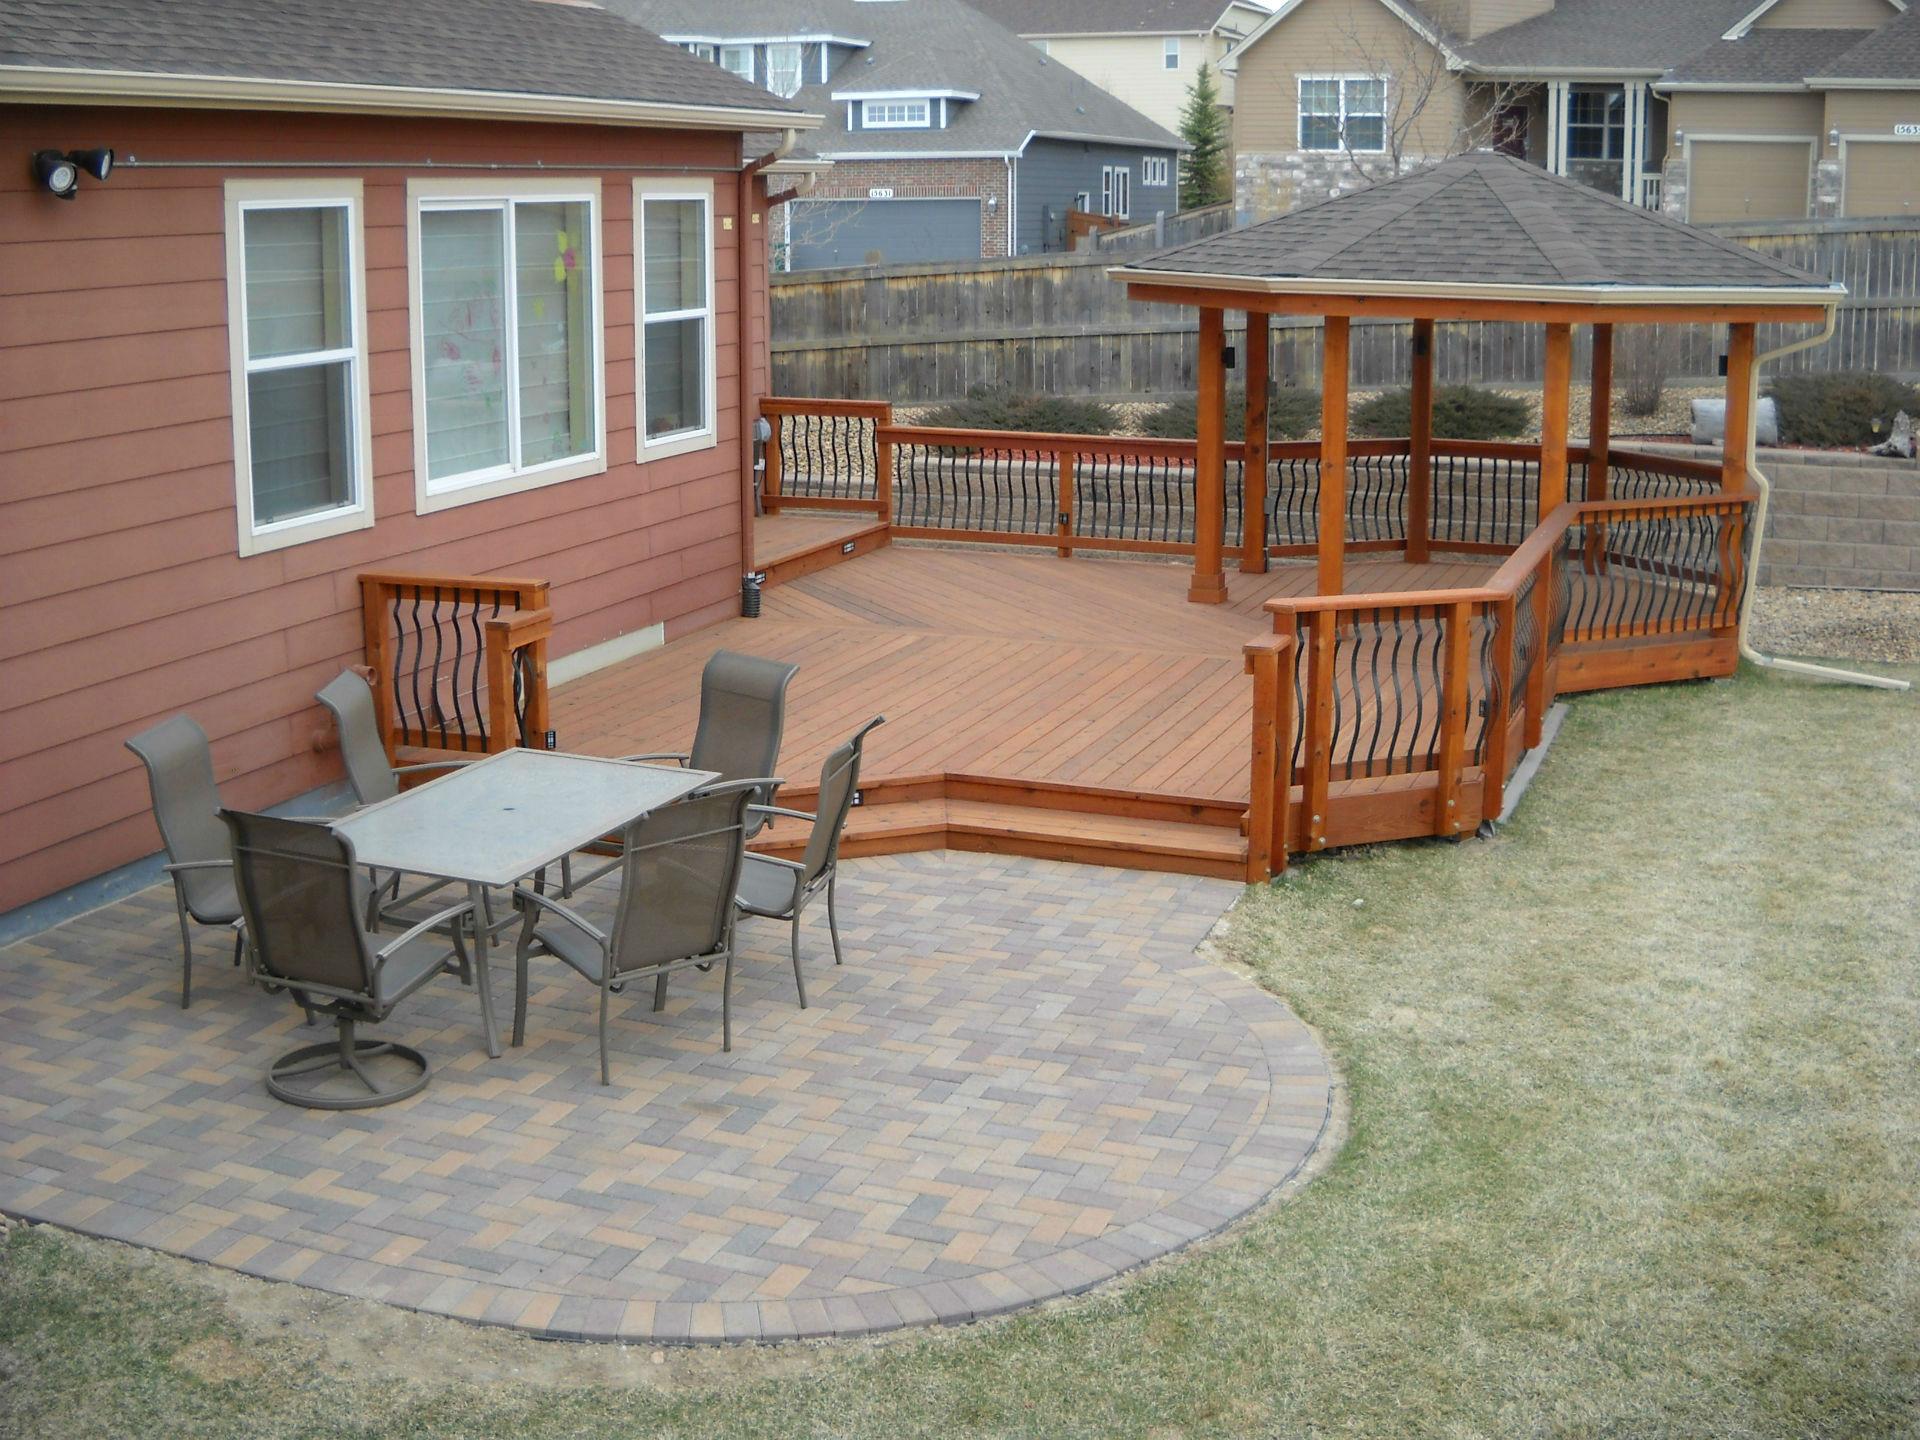 Backyard Deck Plans  Deck & Patio binations DeckTec Outdoor Designs